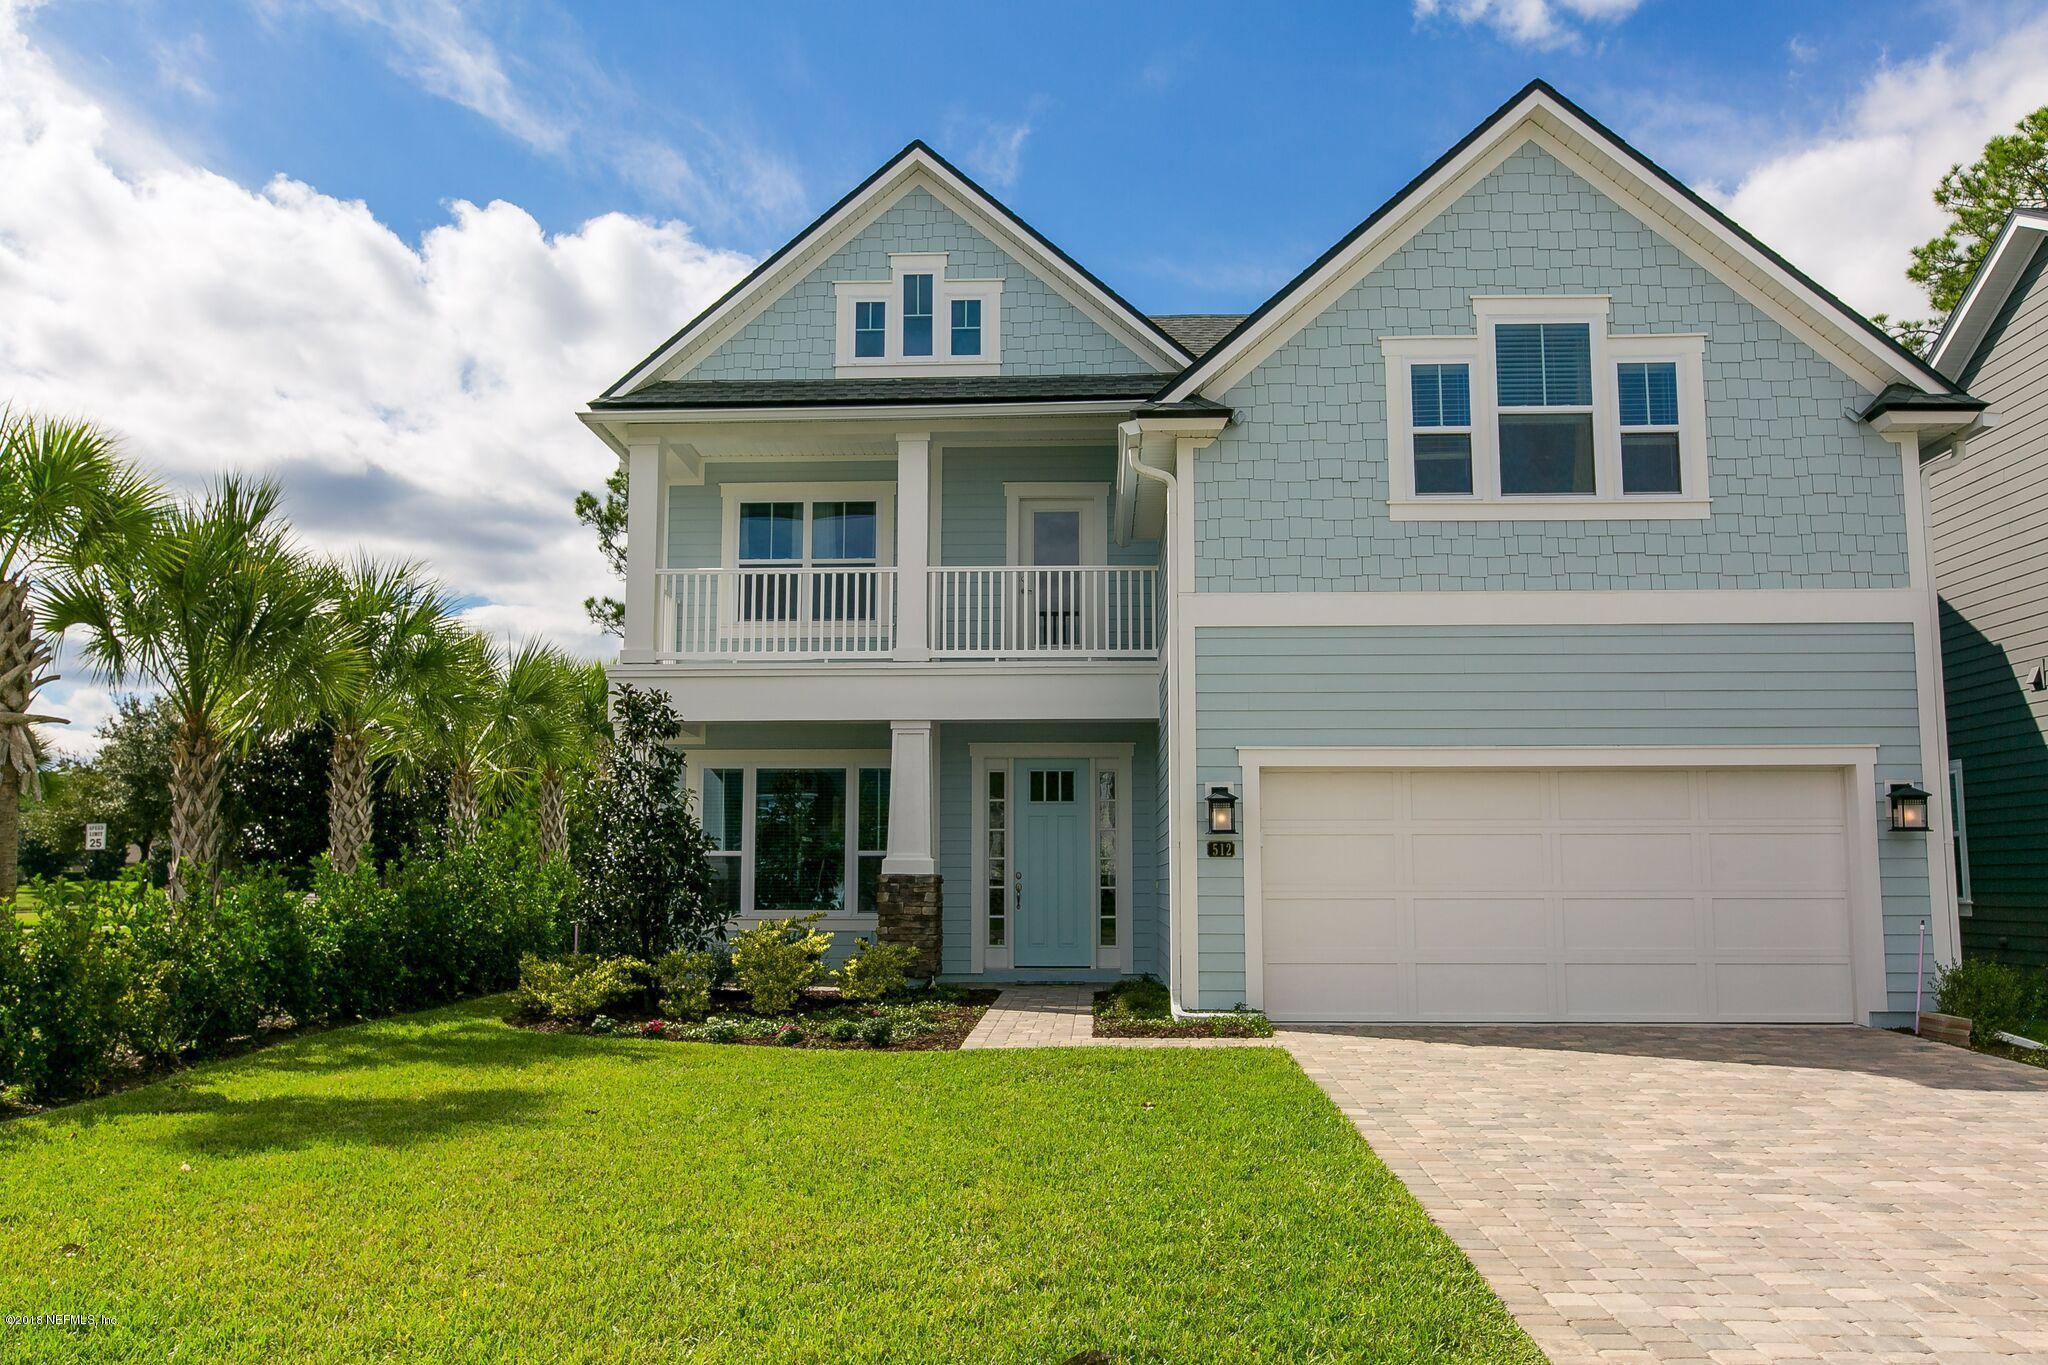 512 PELICAN POINTE, PONTE VEDRA BEACH, FLORIDA 32081, 4 Bedrooms Bedrooms, ,2 BathroomsBathrooms,Residential - single family,For sale,PELICAN POINTE,964955